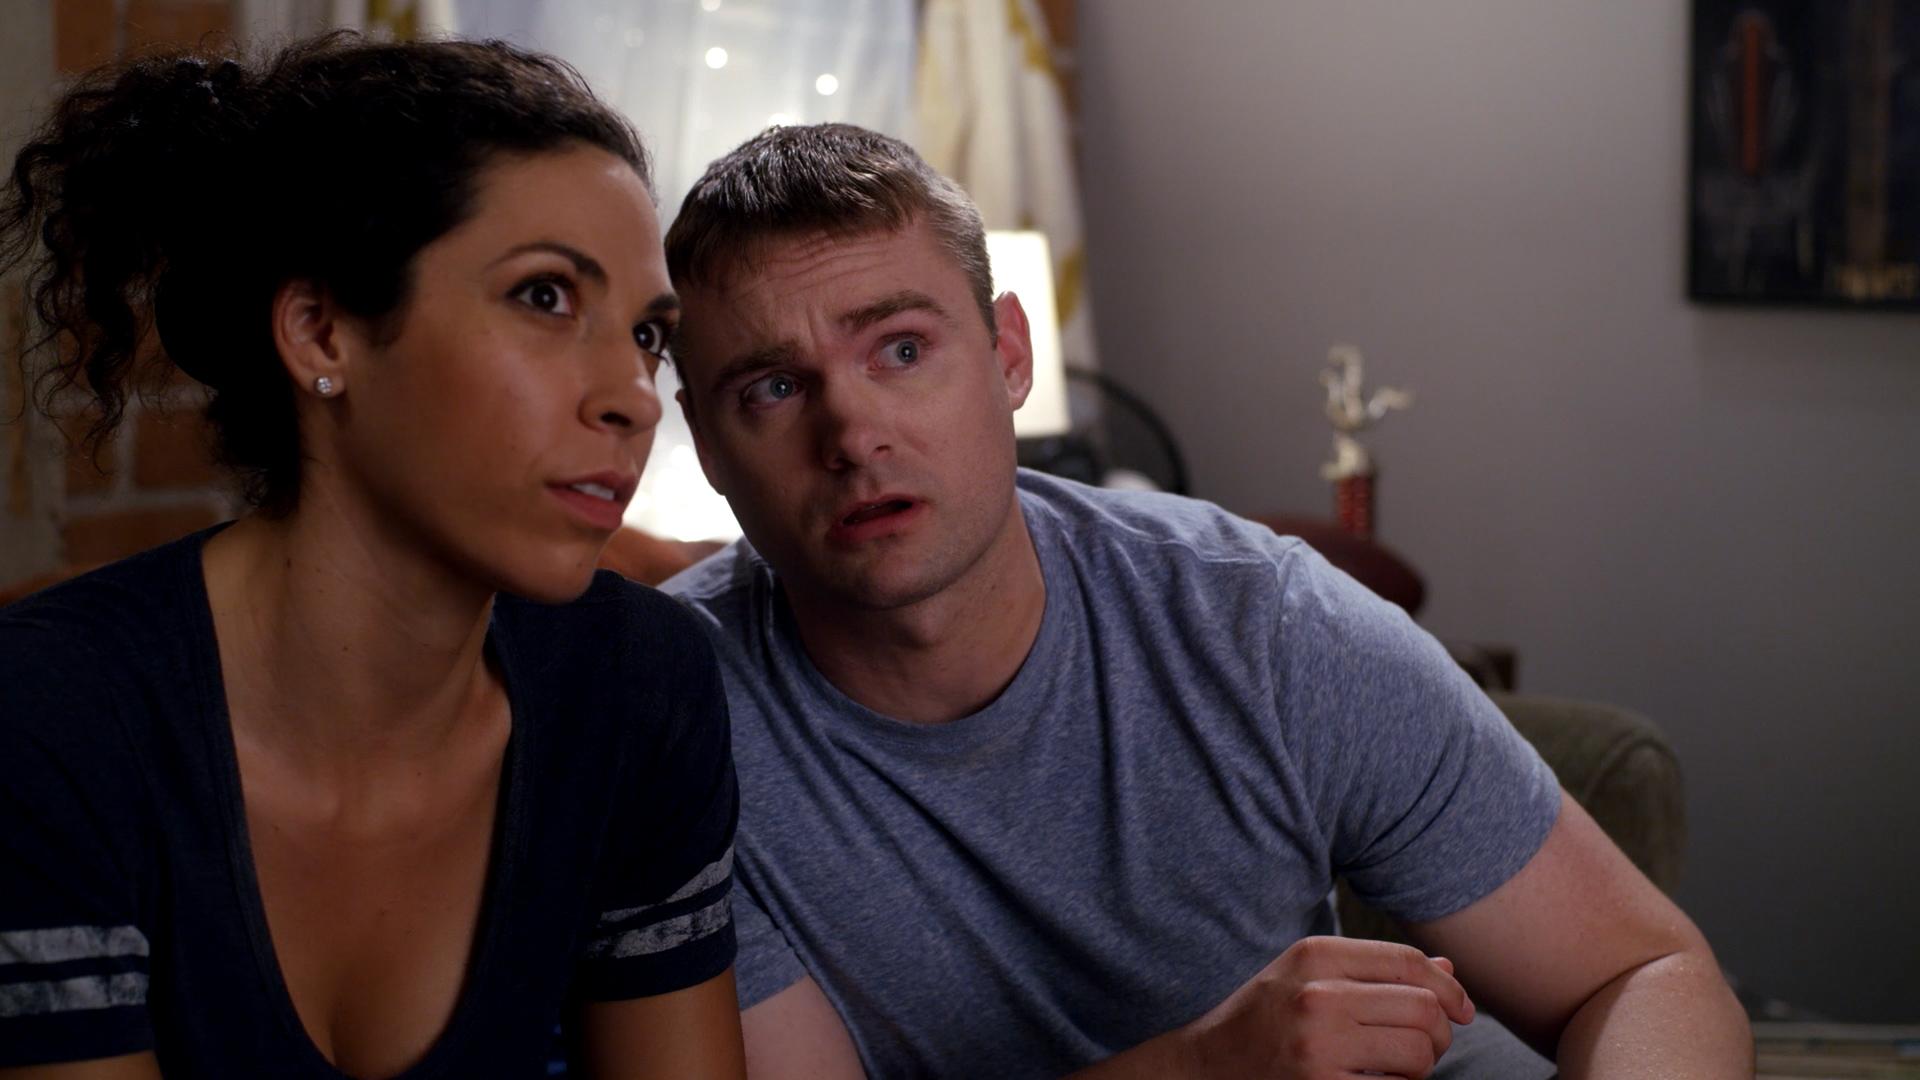 Shana Eva and Robert Sherry in Planet George (2020)